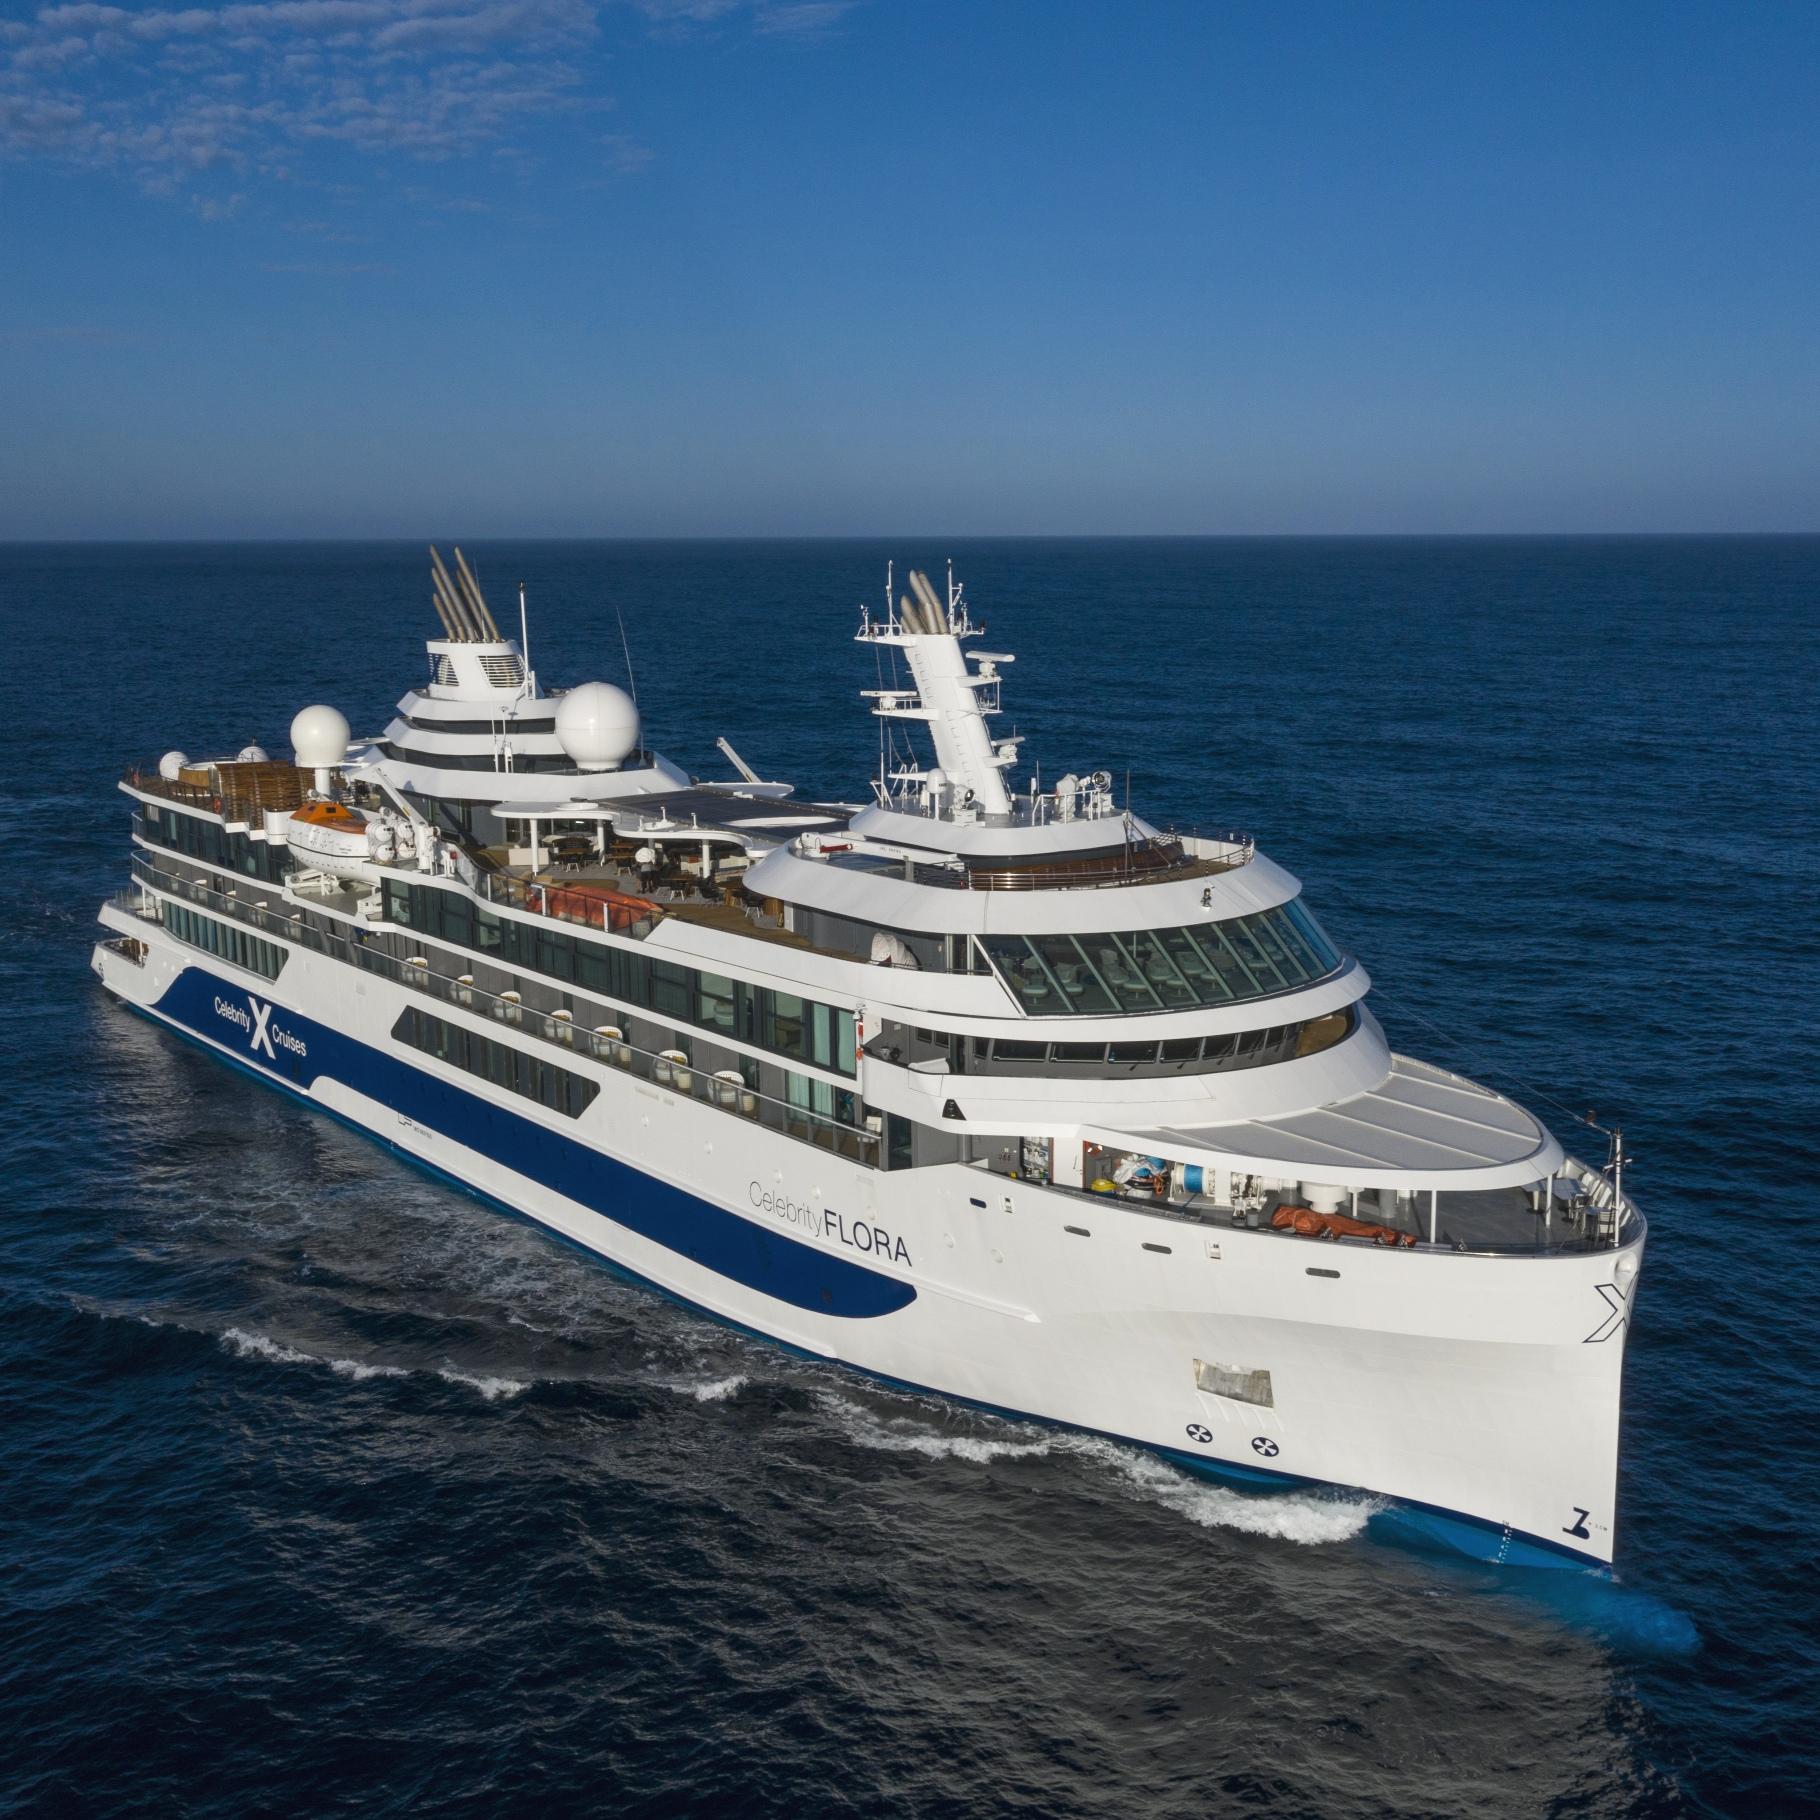 Celebrity Flora Blending Intimate Luxury With Sustainability Cruise To Travel